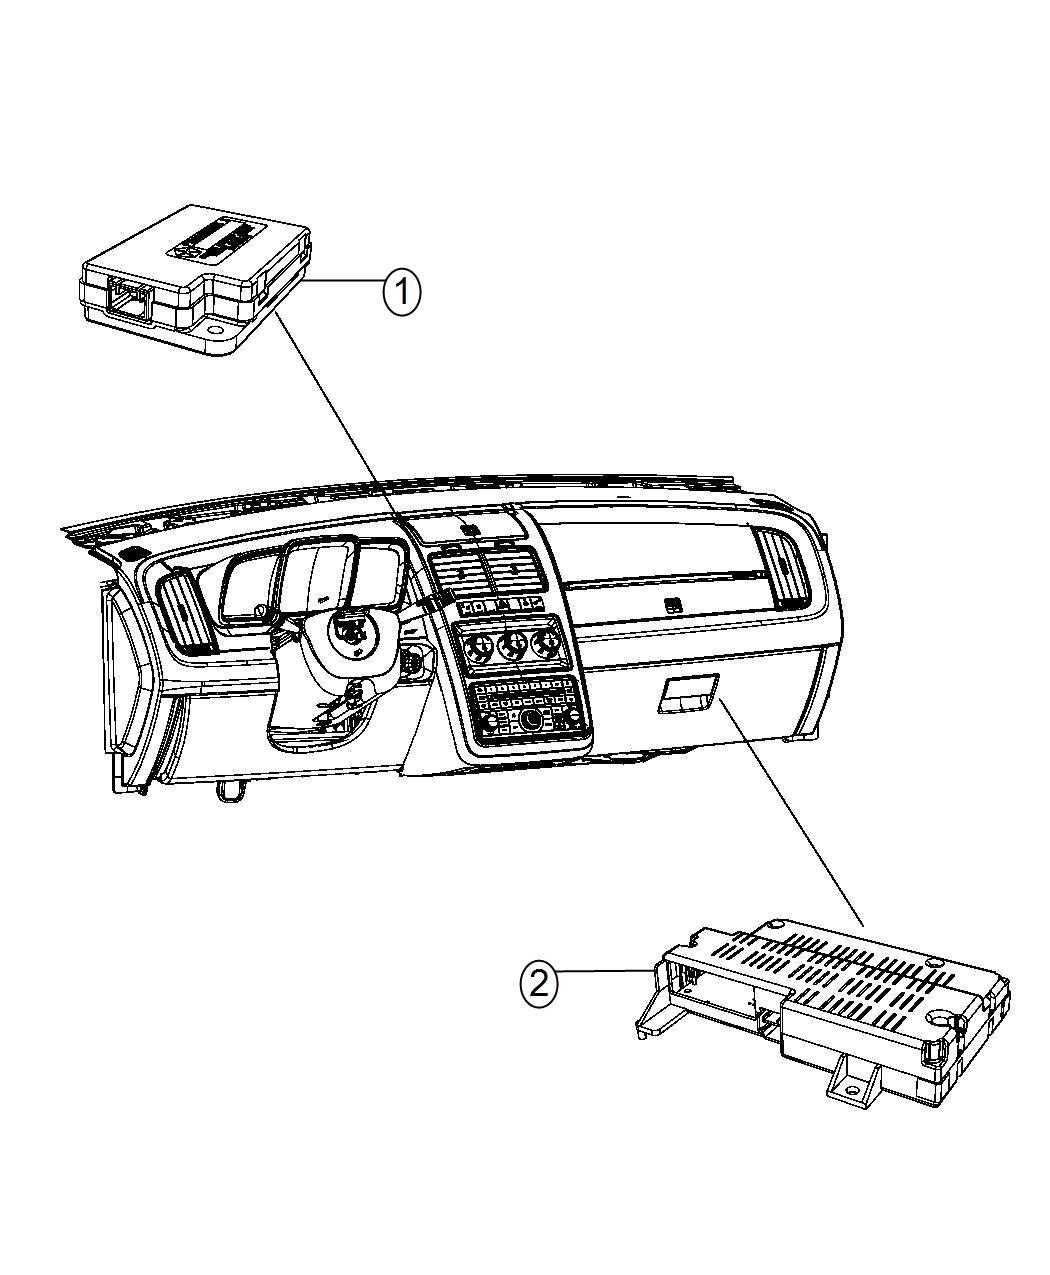 Dodge Journey Module. Uconnect. Hands free. Those, hfm